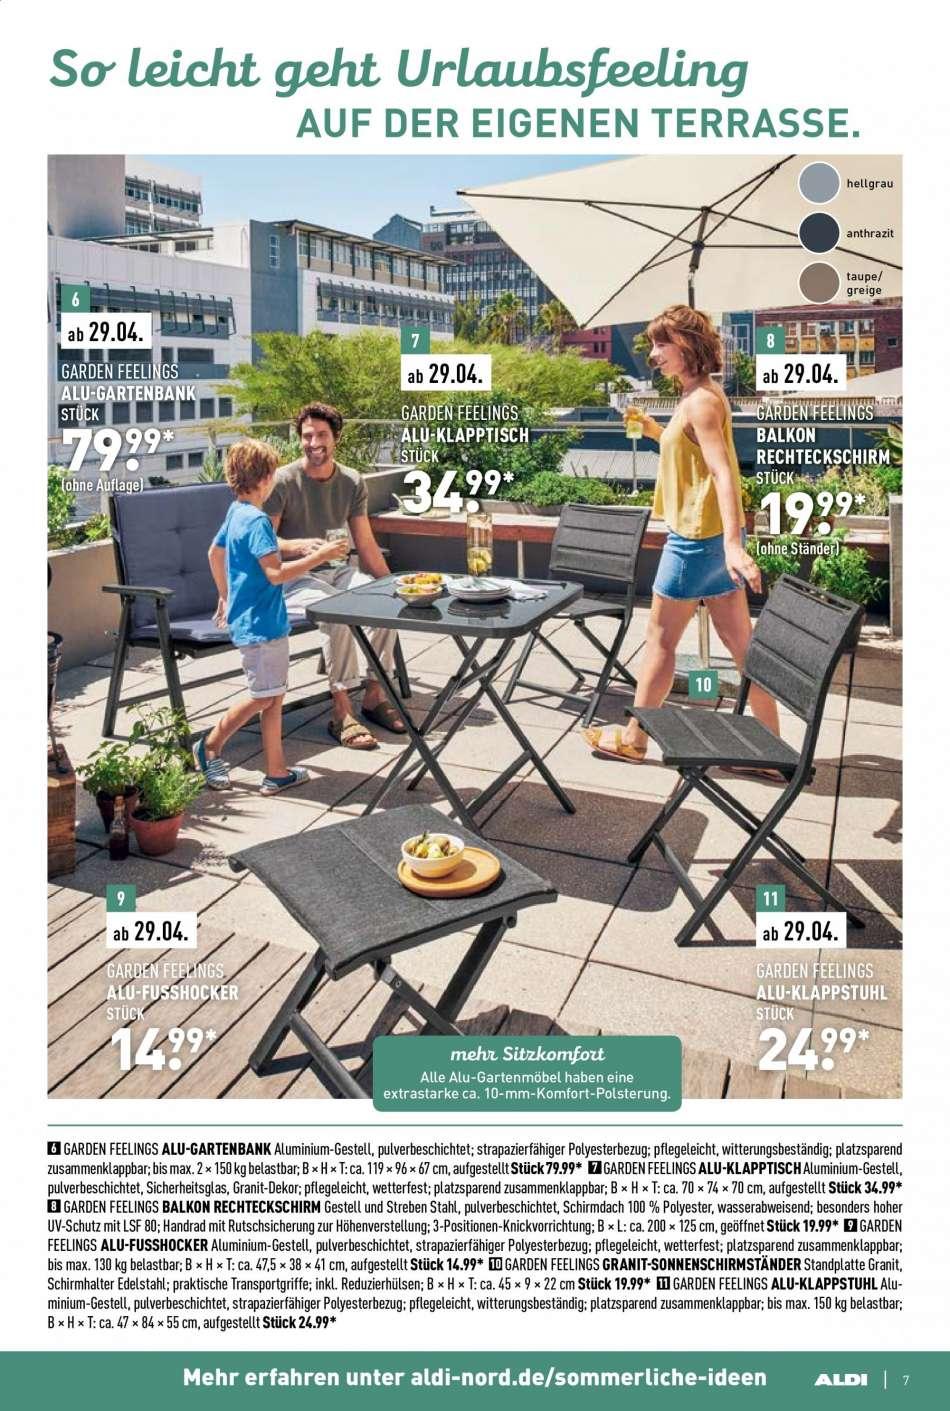 Full Size of Aldi Gartenbank Nord Aktuelle Prospekte Rabatt Kompass Relaxsessel Garten Wohnzimmer Aldi Gartenbank